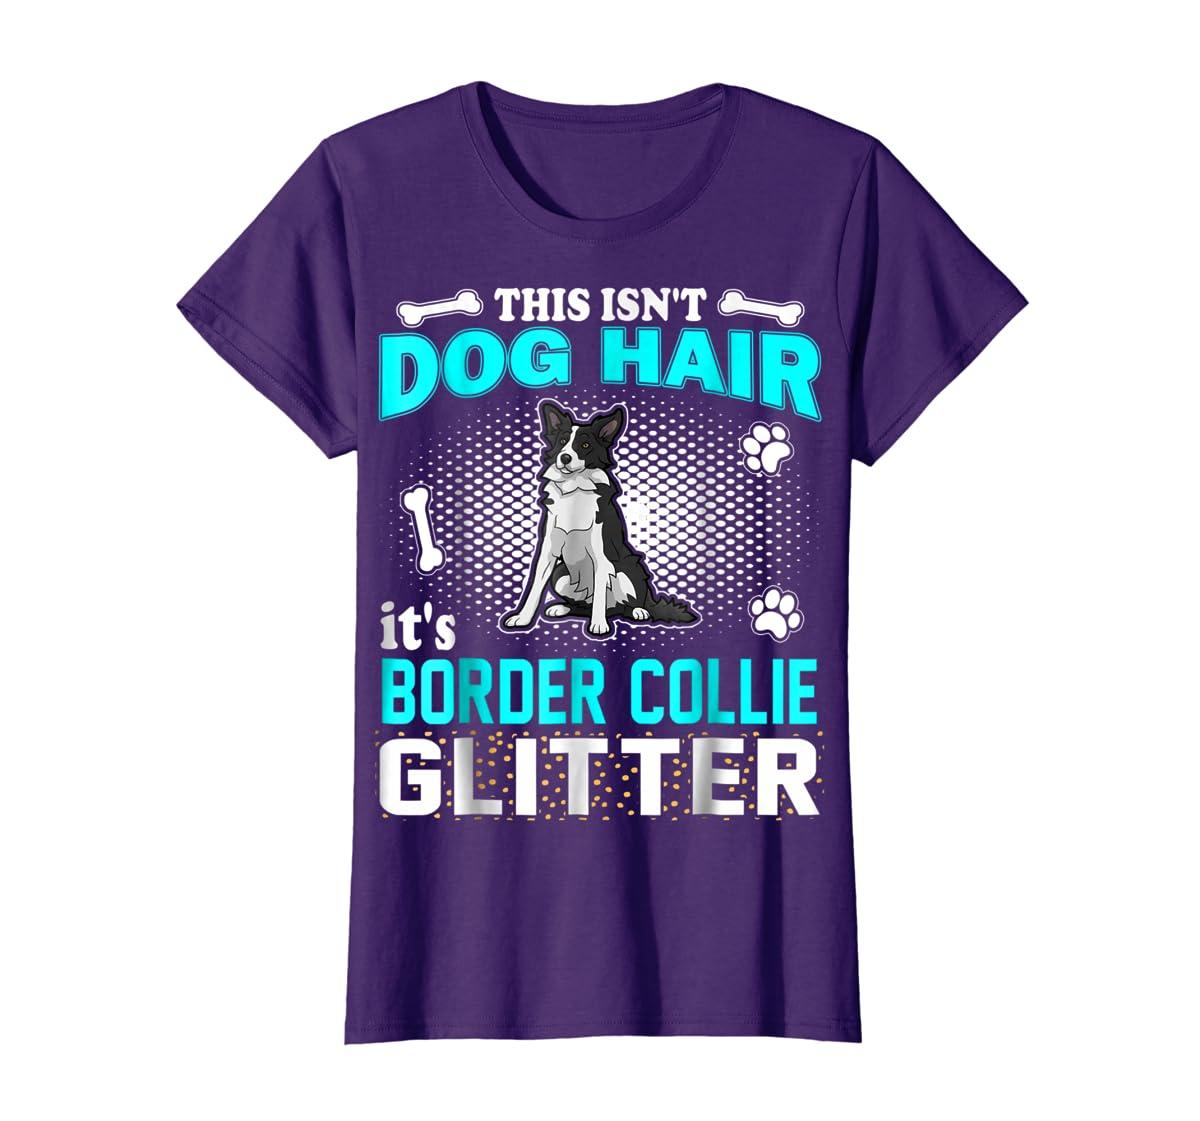 This Isn't Dog Hair It's Border Collie Glitter T-Shirt-Women's T-Shirt-Purple